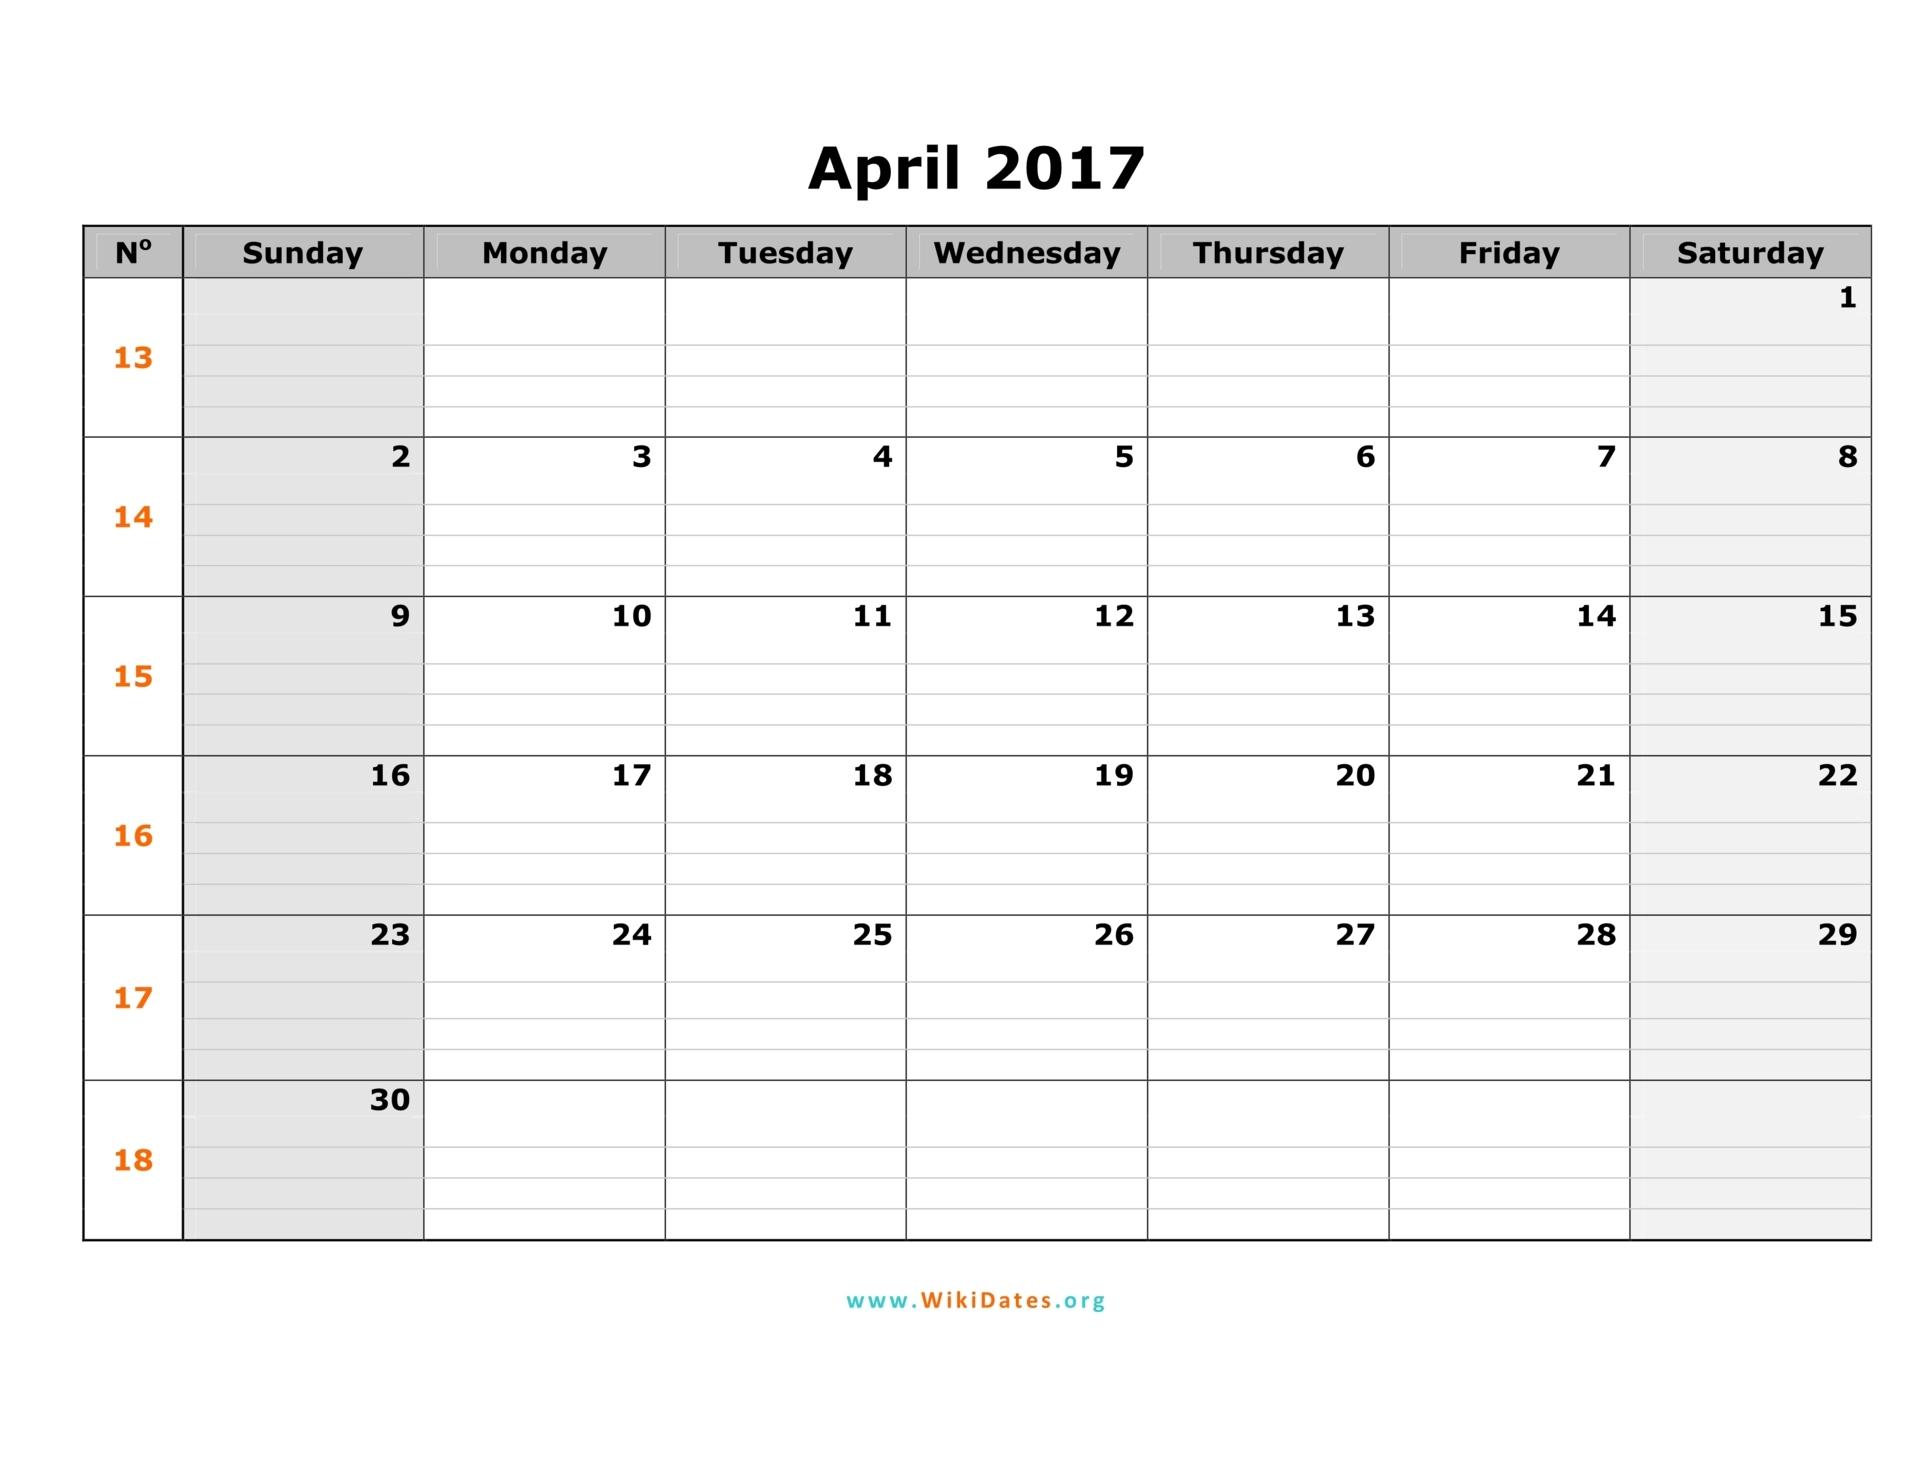 April 2017 Calendar   WikiDates.org